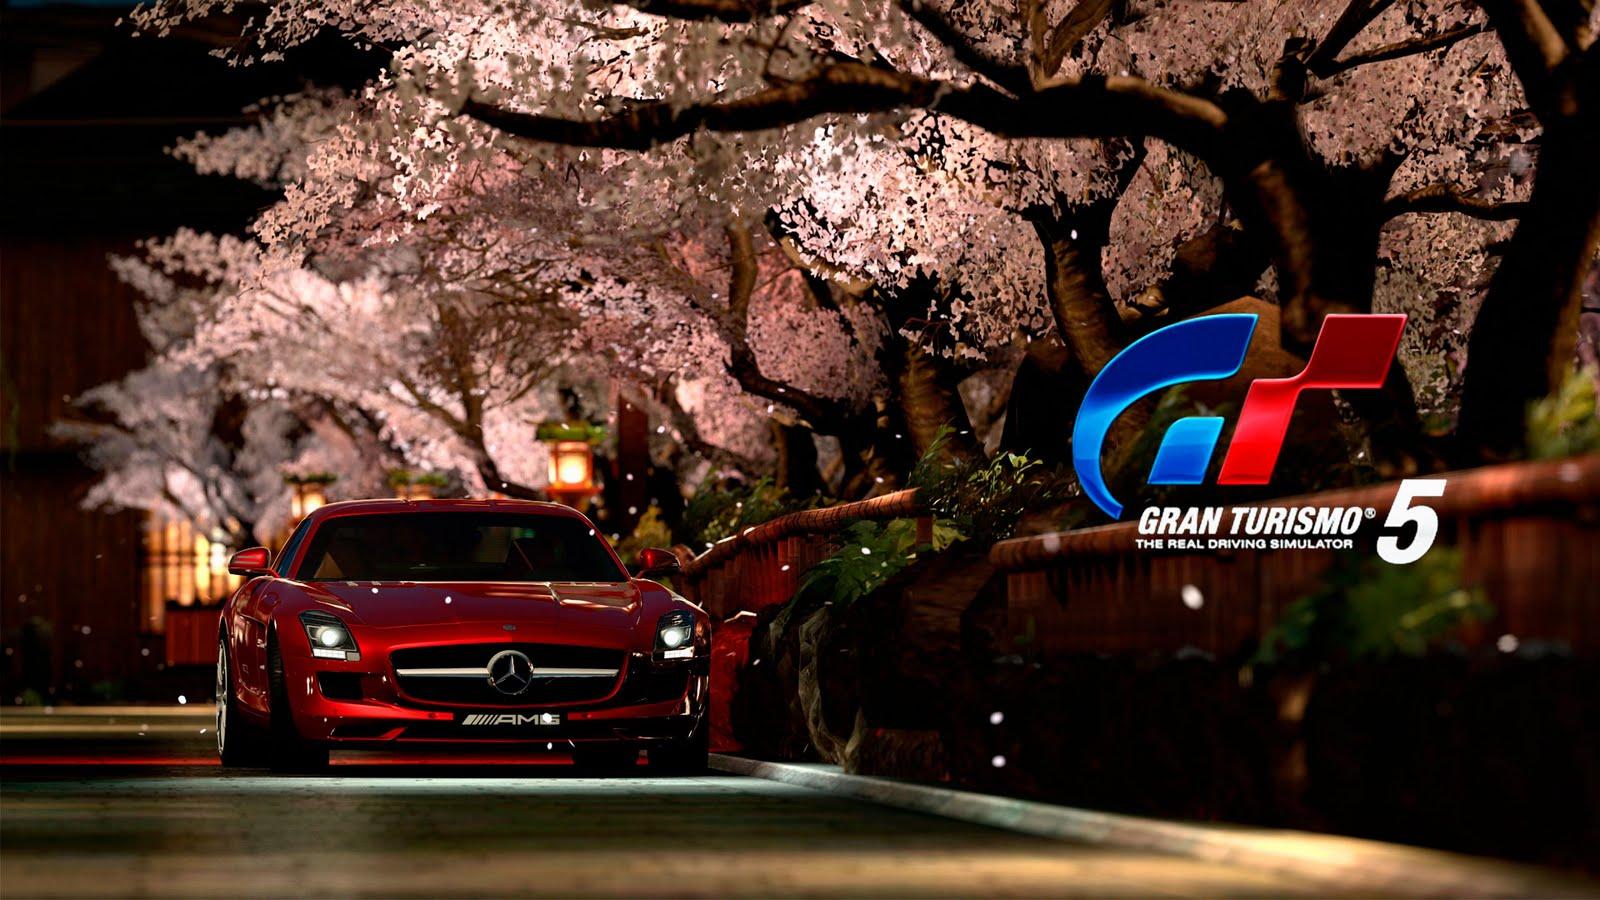 gran turismo 5 prologue game wallpapers - 3 Gran Turismo 5 Prologue HD Wallpapers Backgrounds